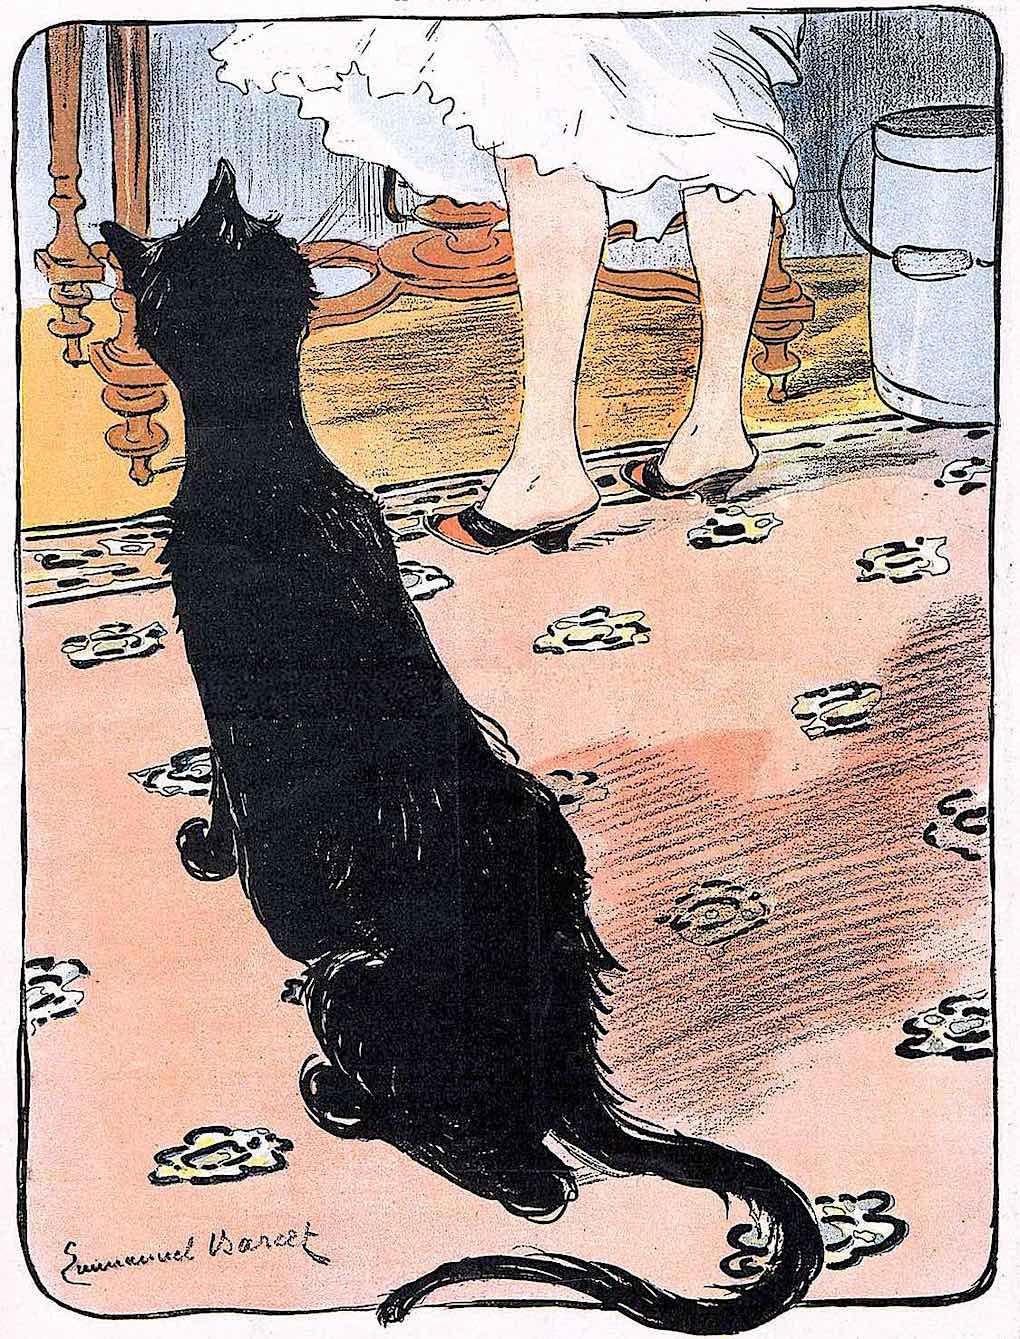 an Emmanuel Barcet 1902 illustration of a cat waiting for food